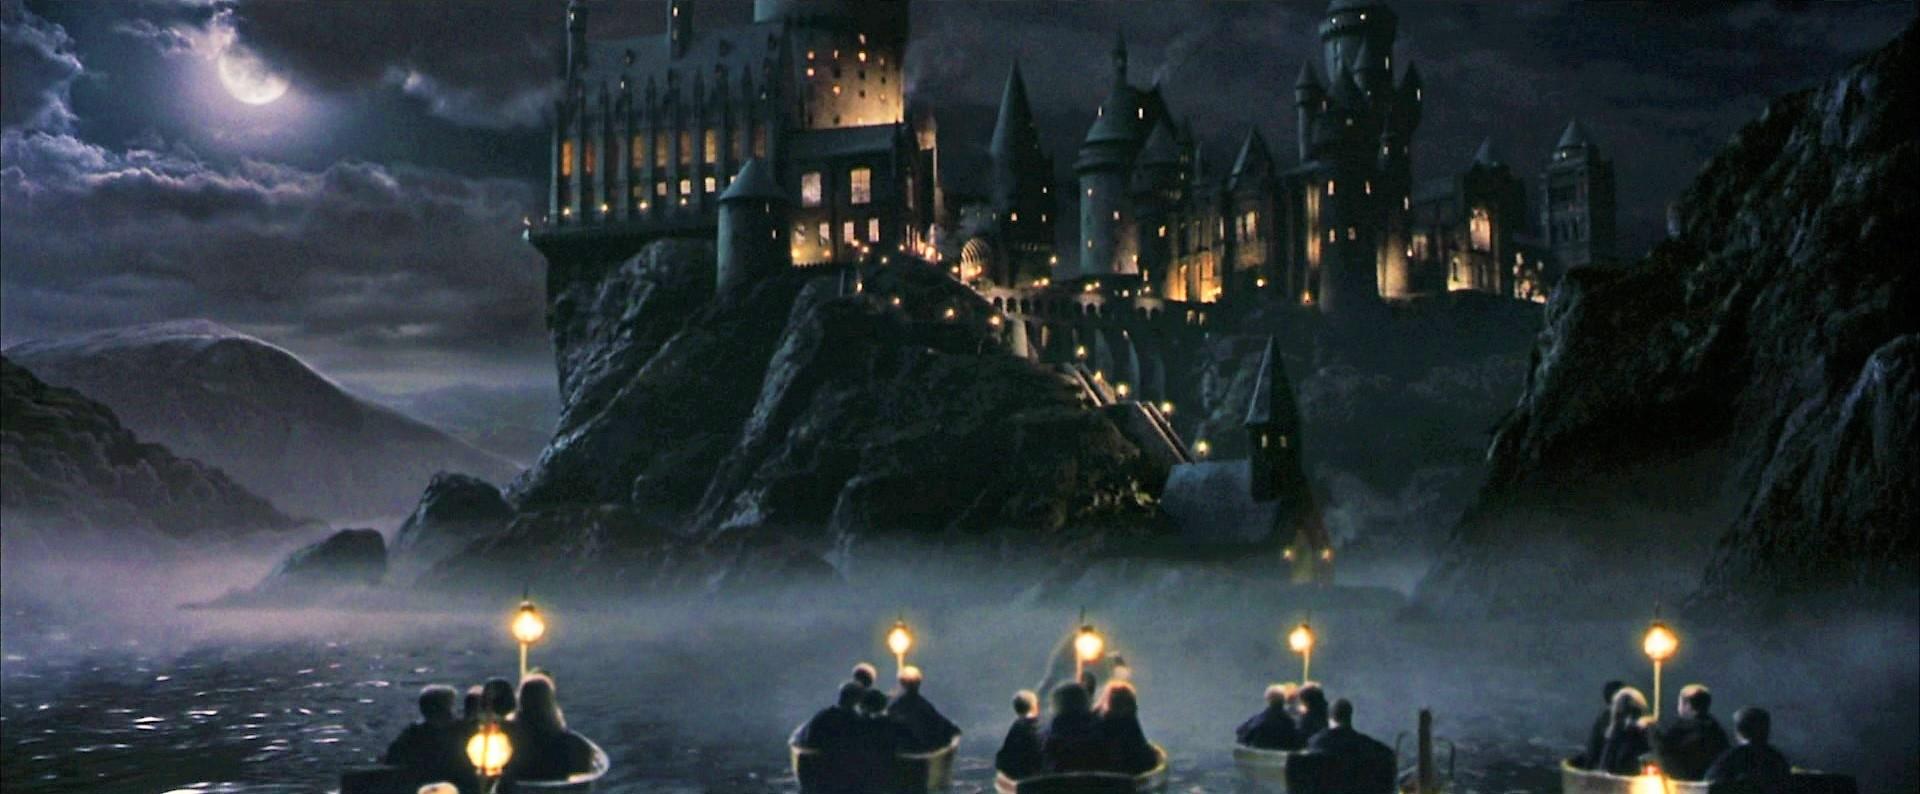 http://img3.wikia.nocookie.net/__cb20090509160456/harrypotter/images/e/ed/Hogwarts_boats_1.jpg